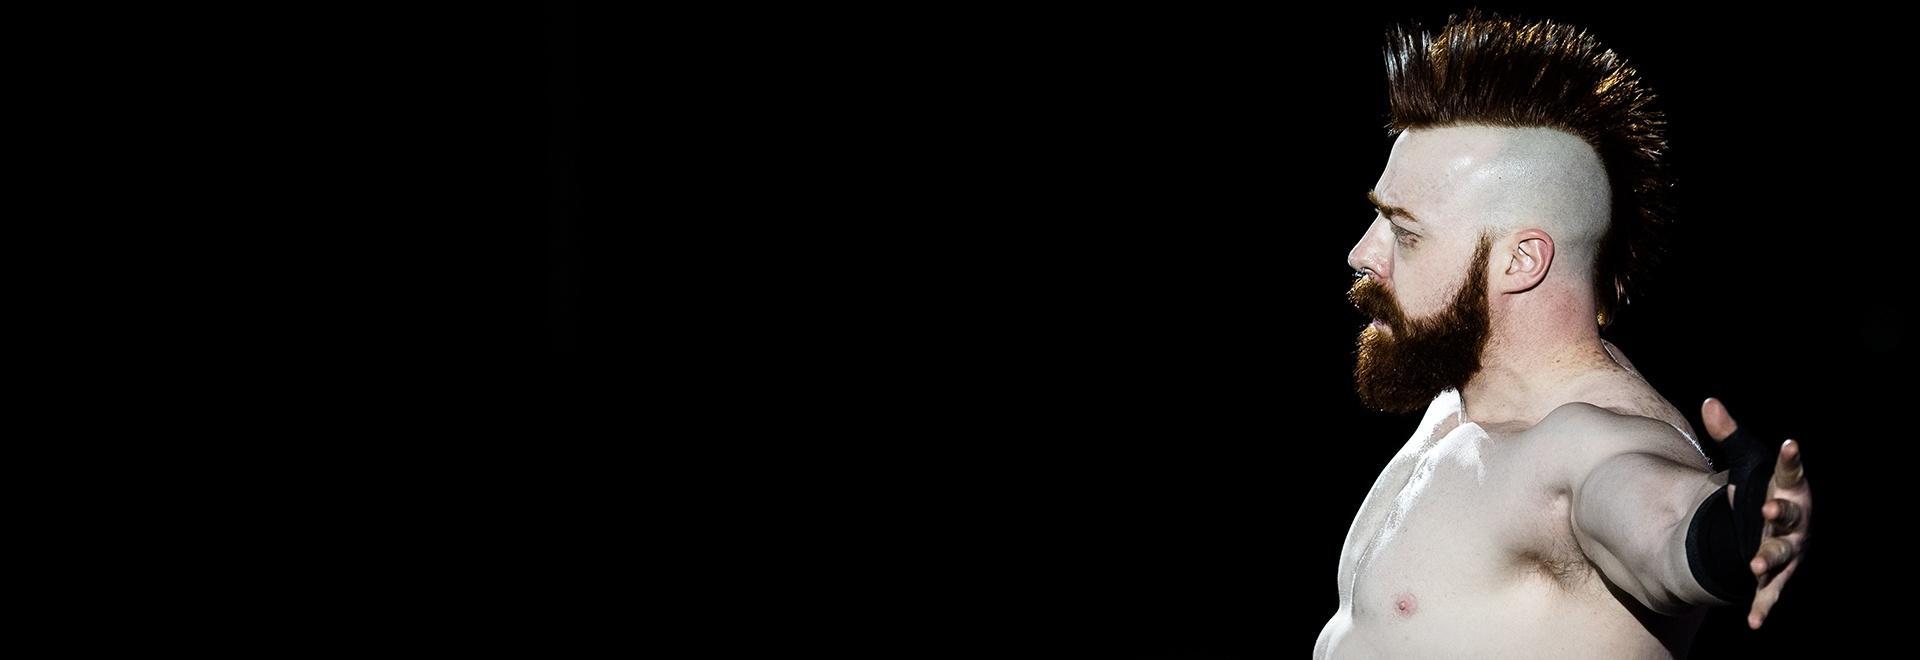 Ep. 50